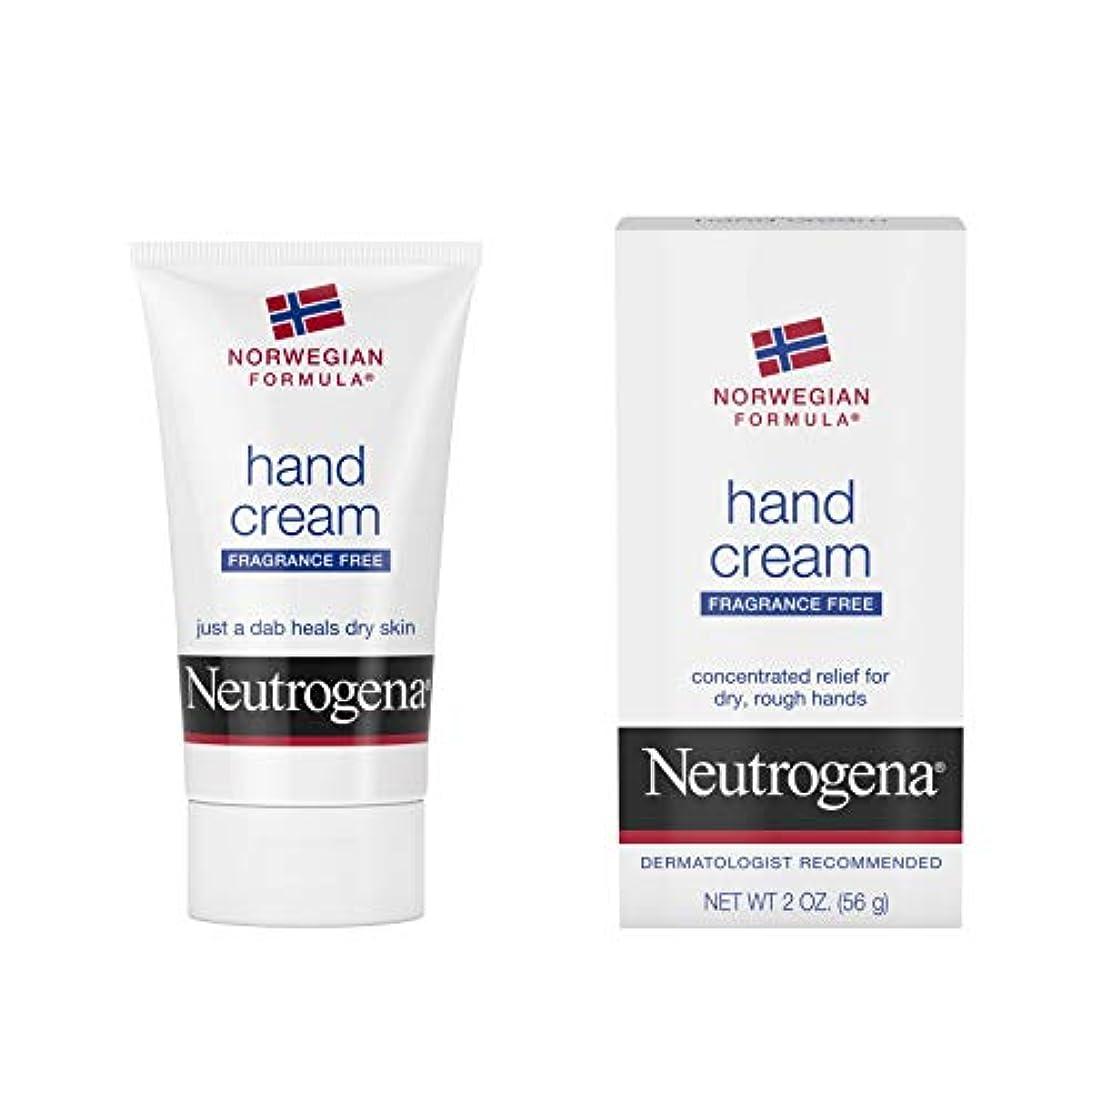 労働大学生剥離Neutrogena Norwegian Formula Hand Cream Fragrance-Free 60 ml (並行輸入品)